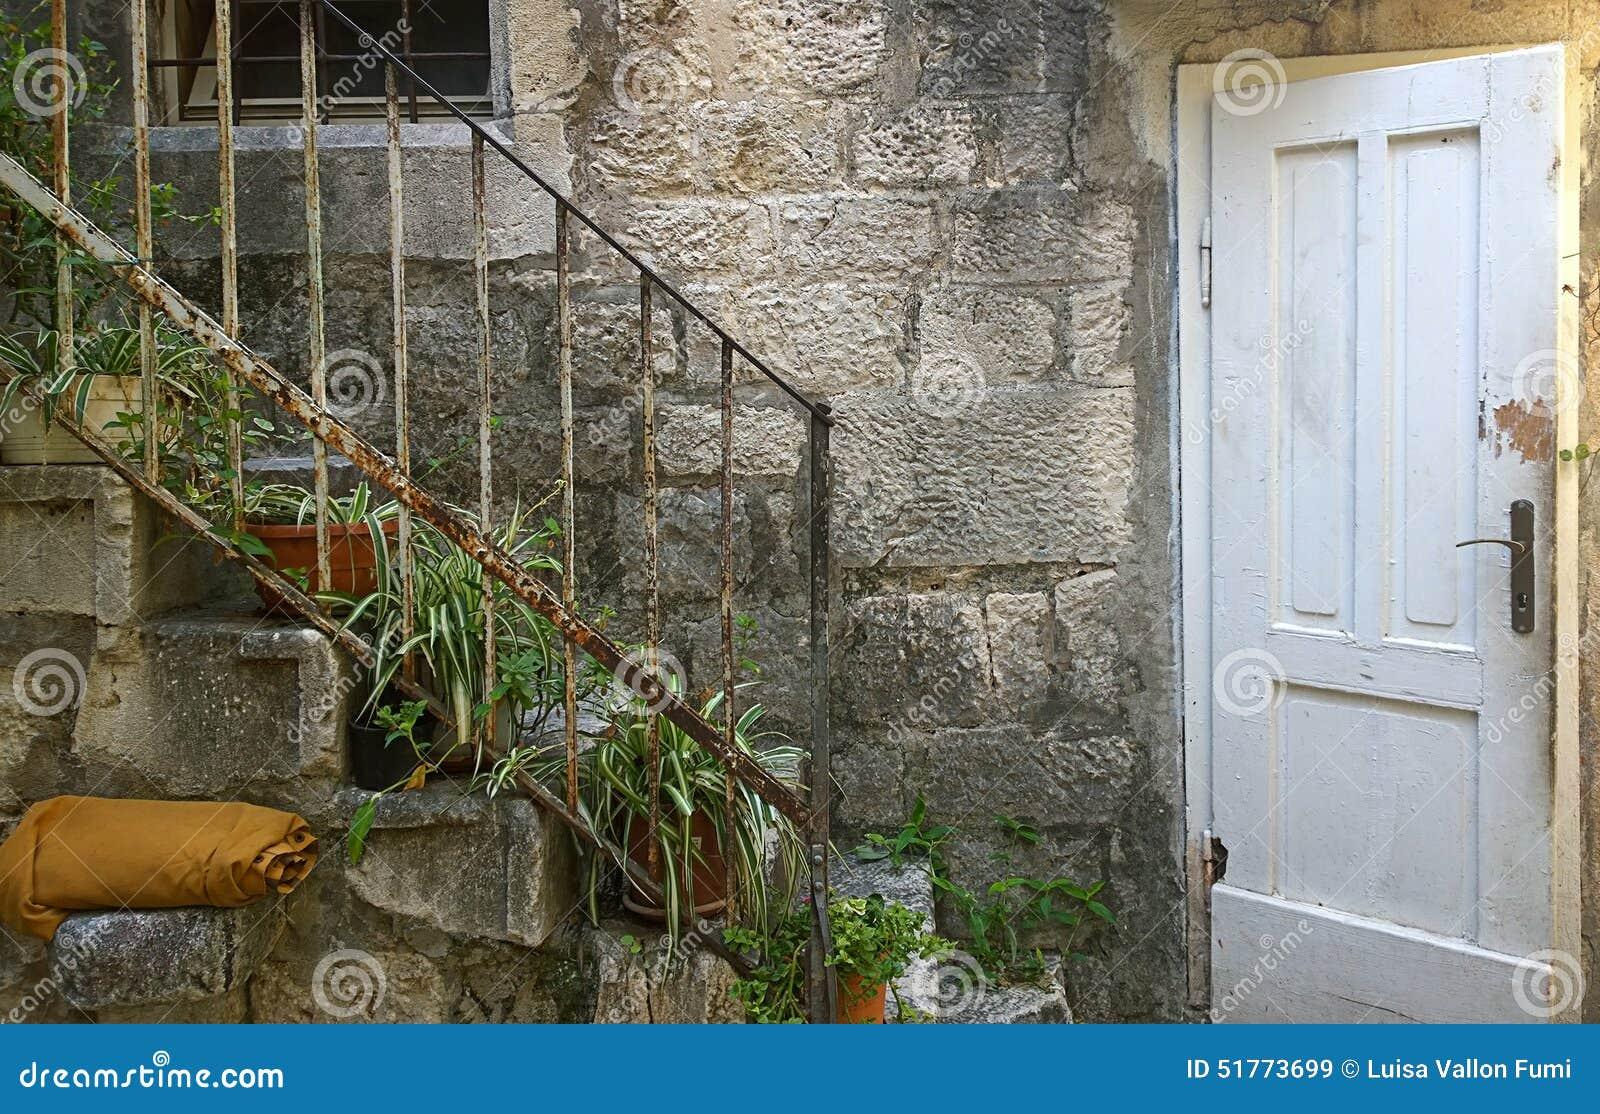 Illuminazione esterna casa rustica pavimentazione esterna casa di